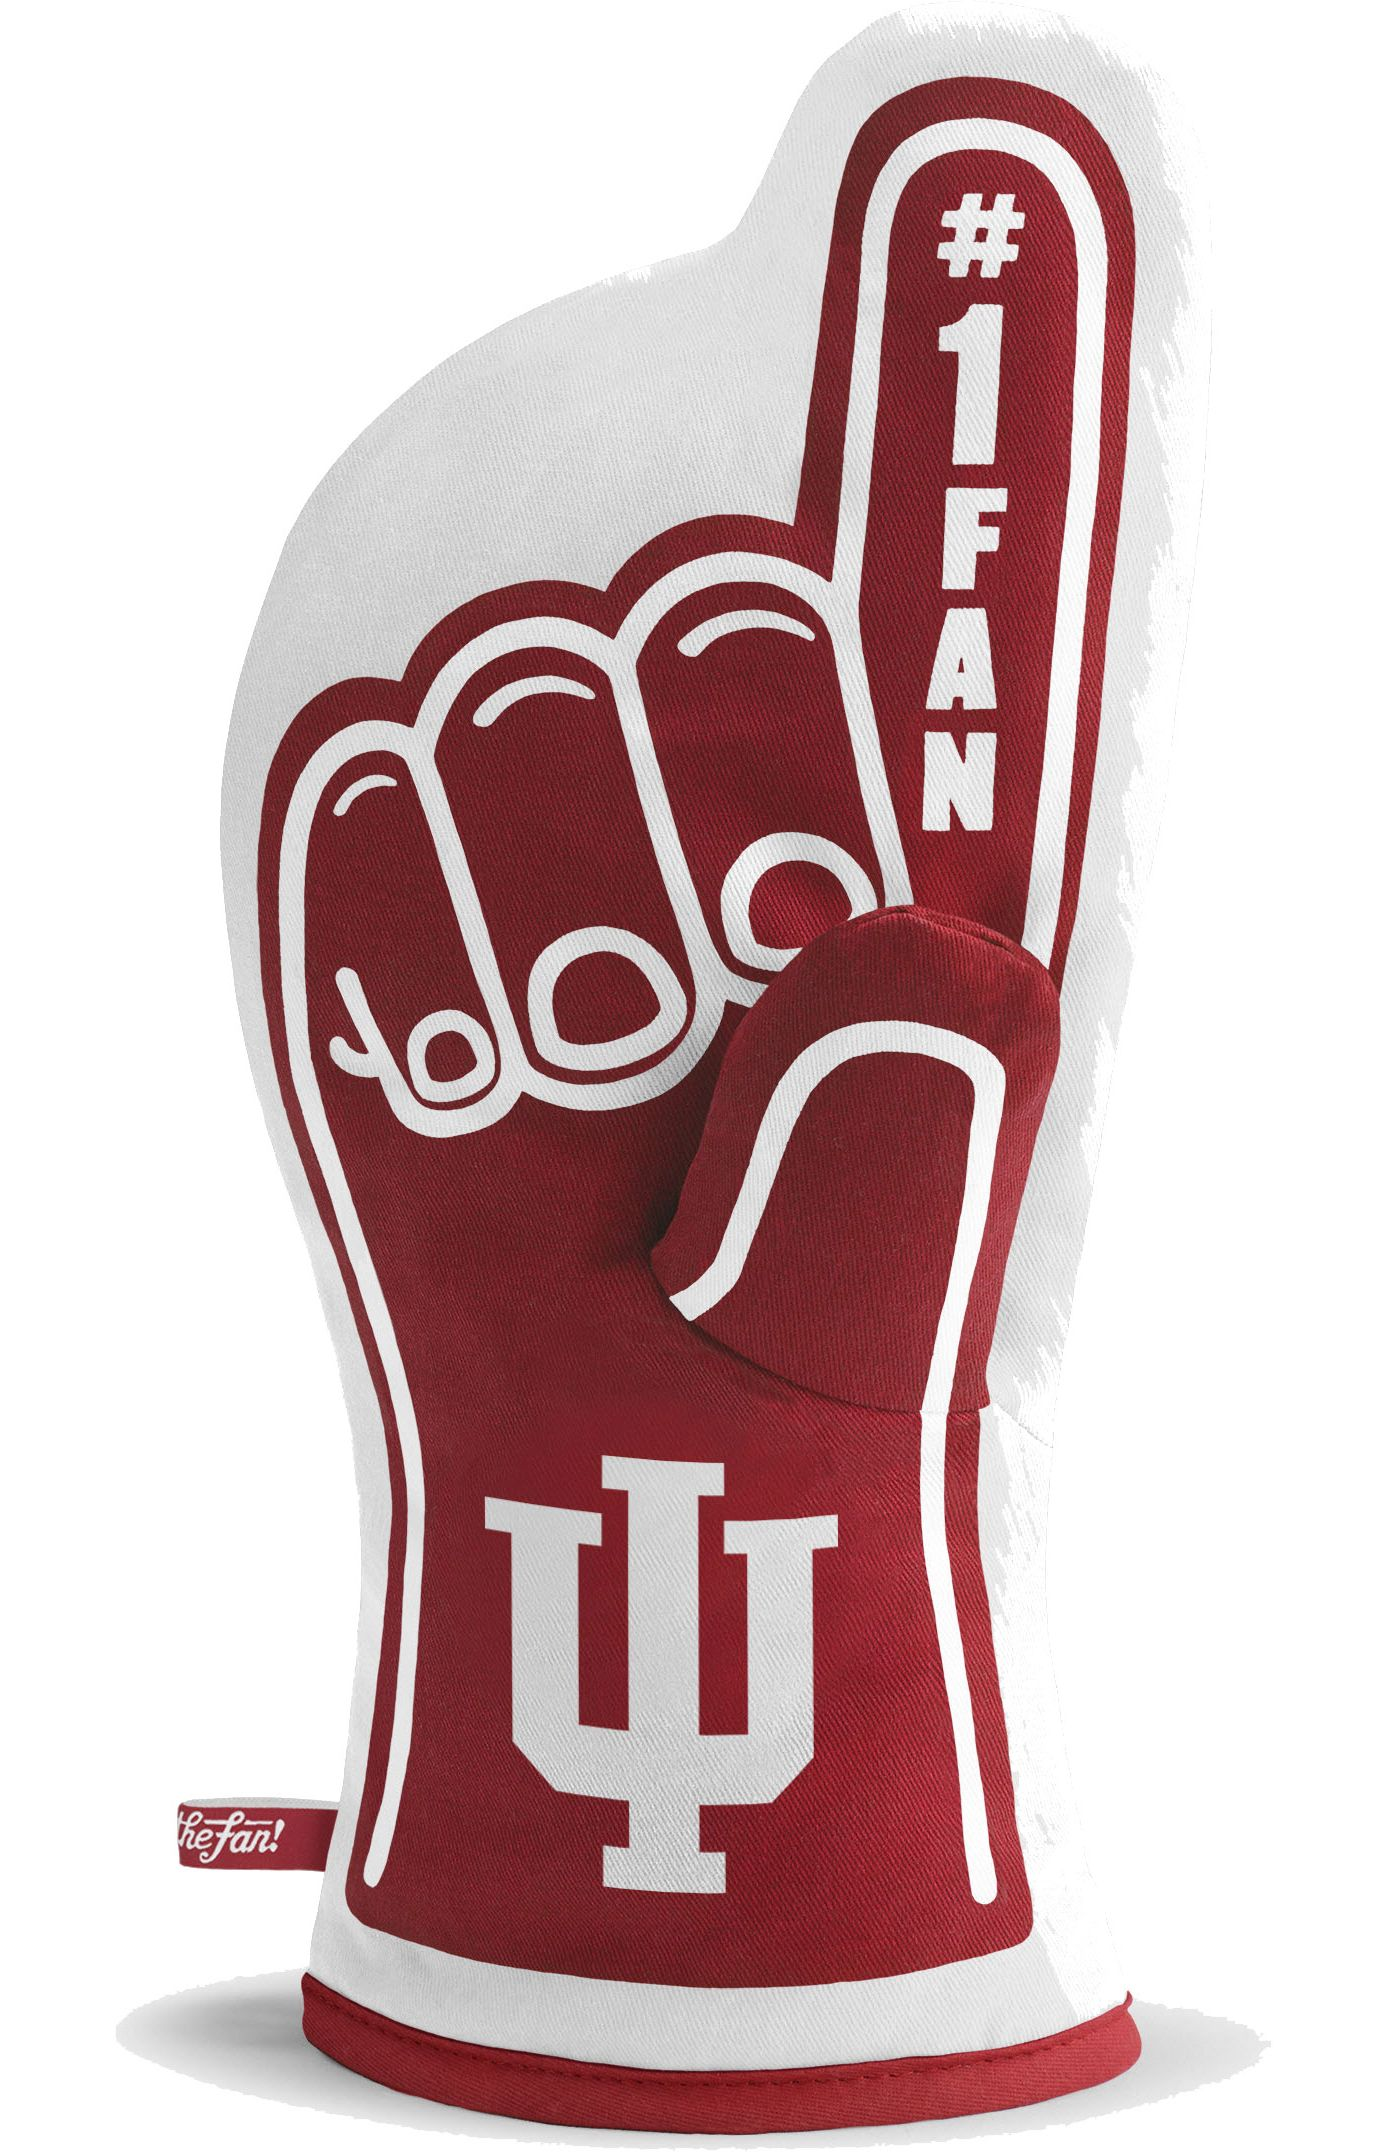 You The Fan Indiana Hoosiers #1 Oven Mitt